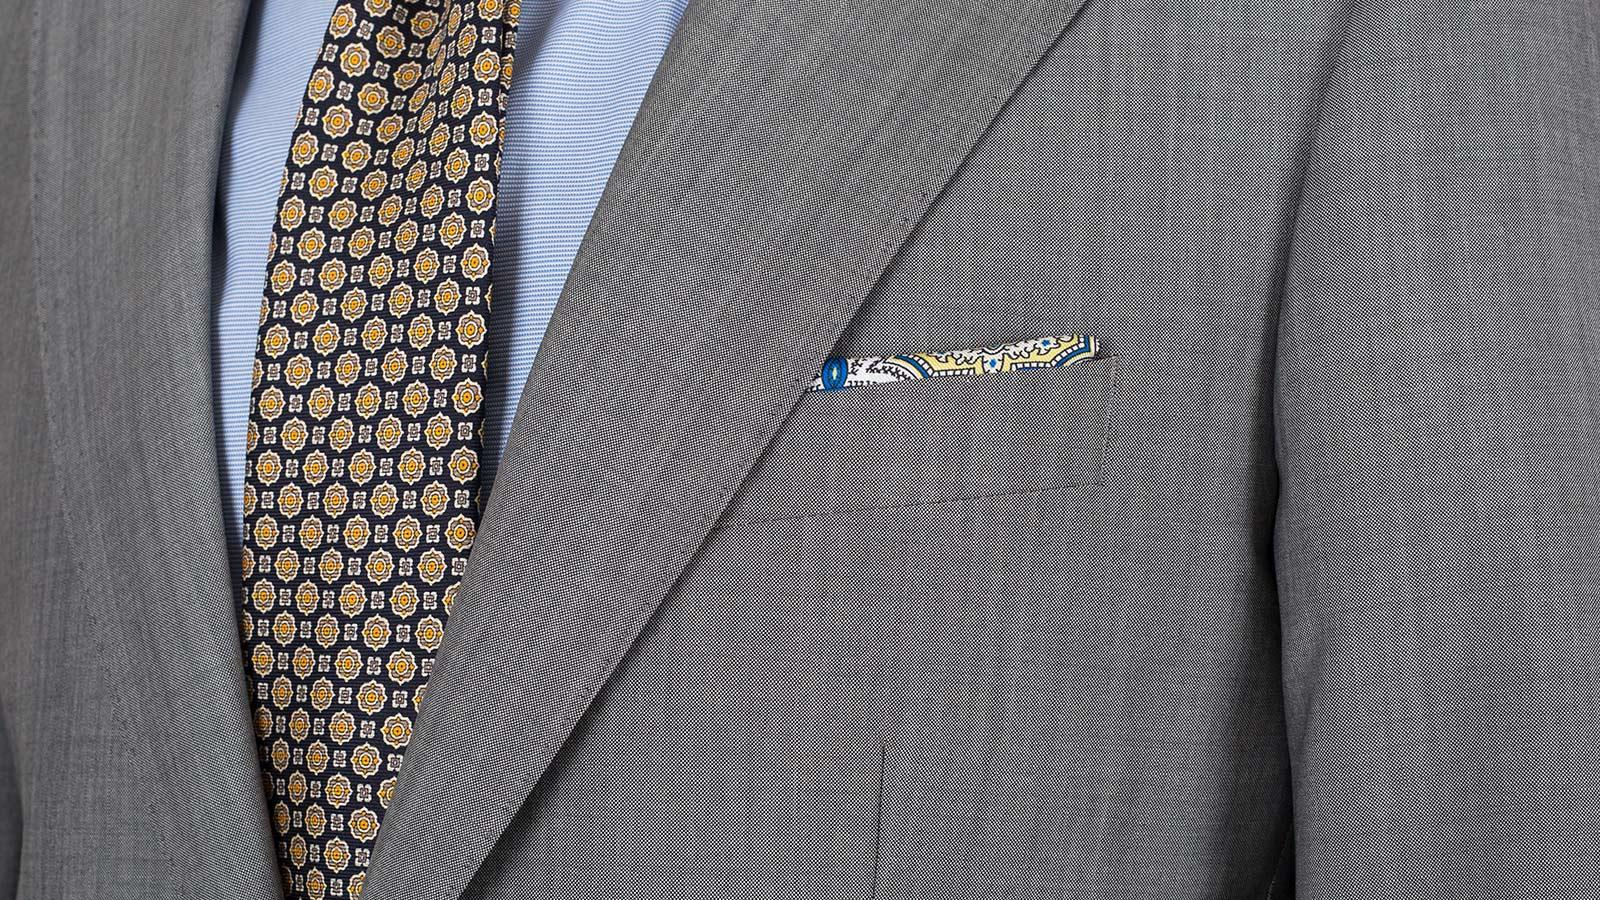 Suit in Light Grey Wool & Mohair - slider image 1